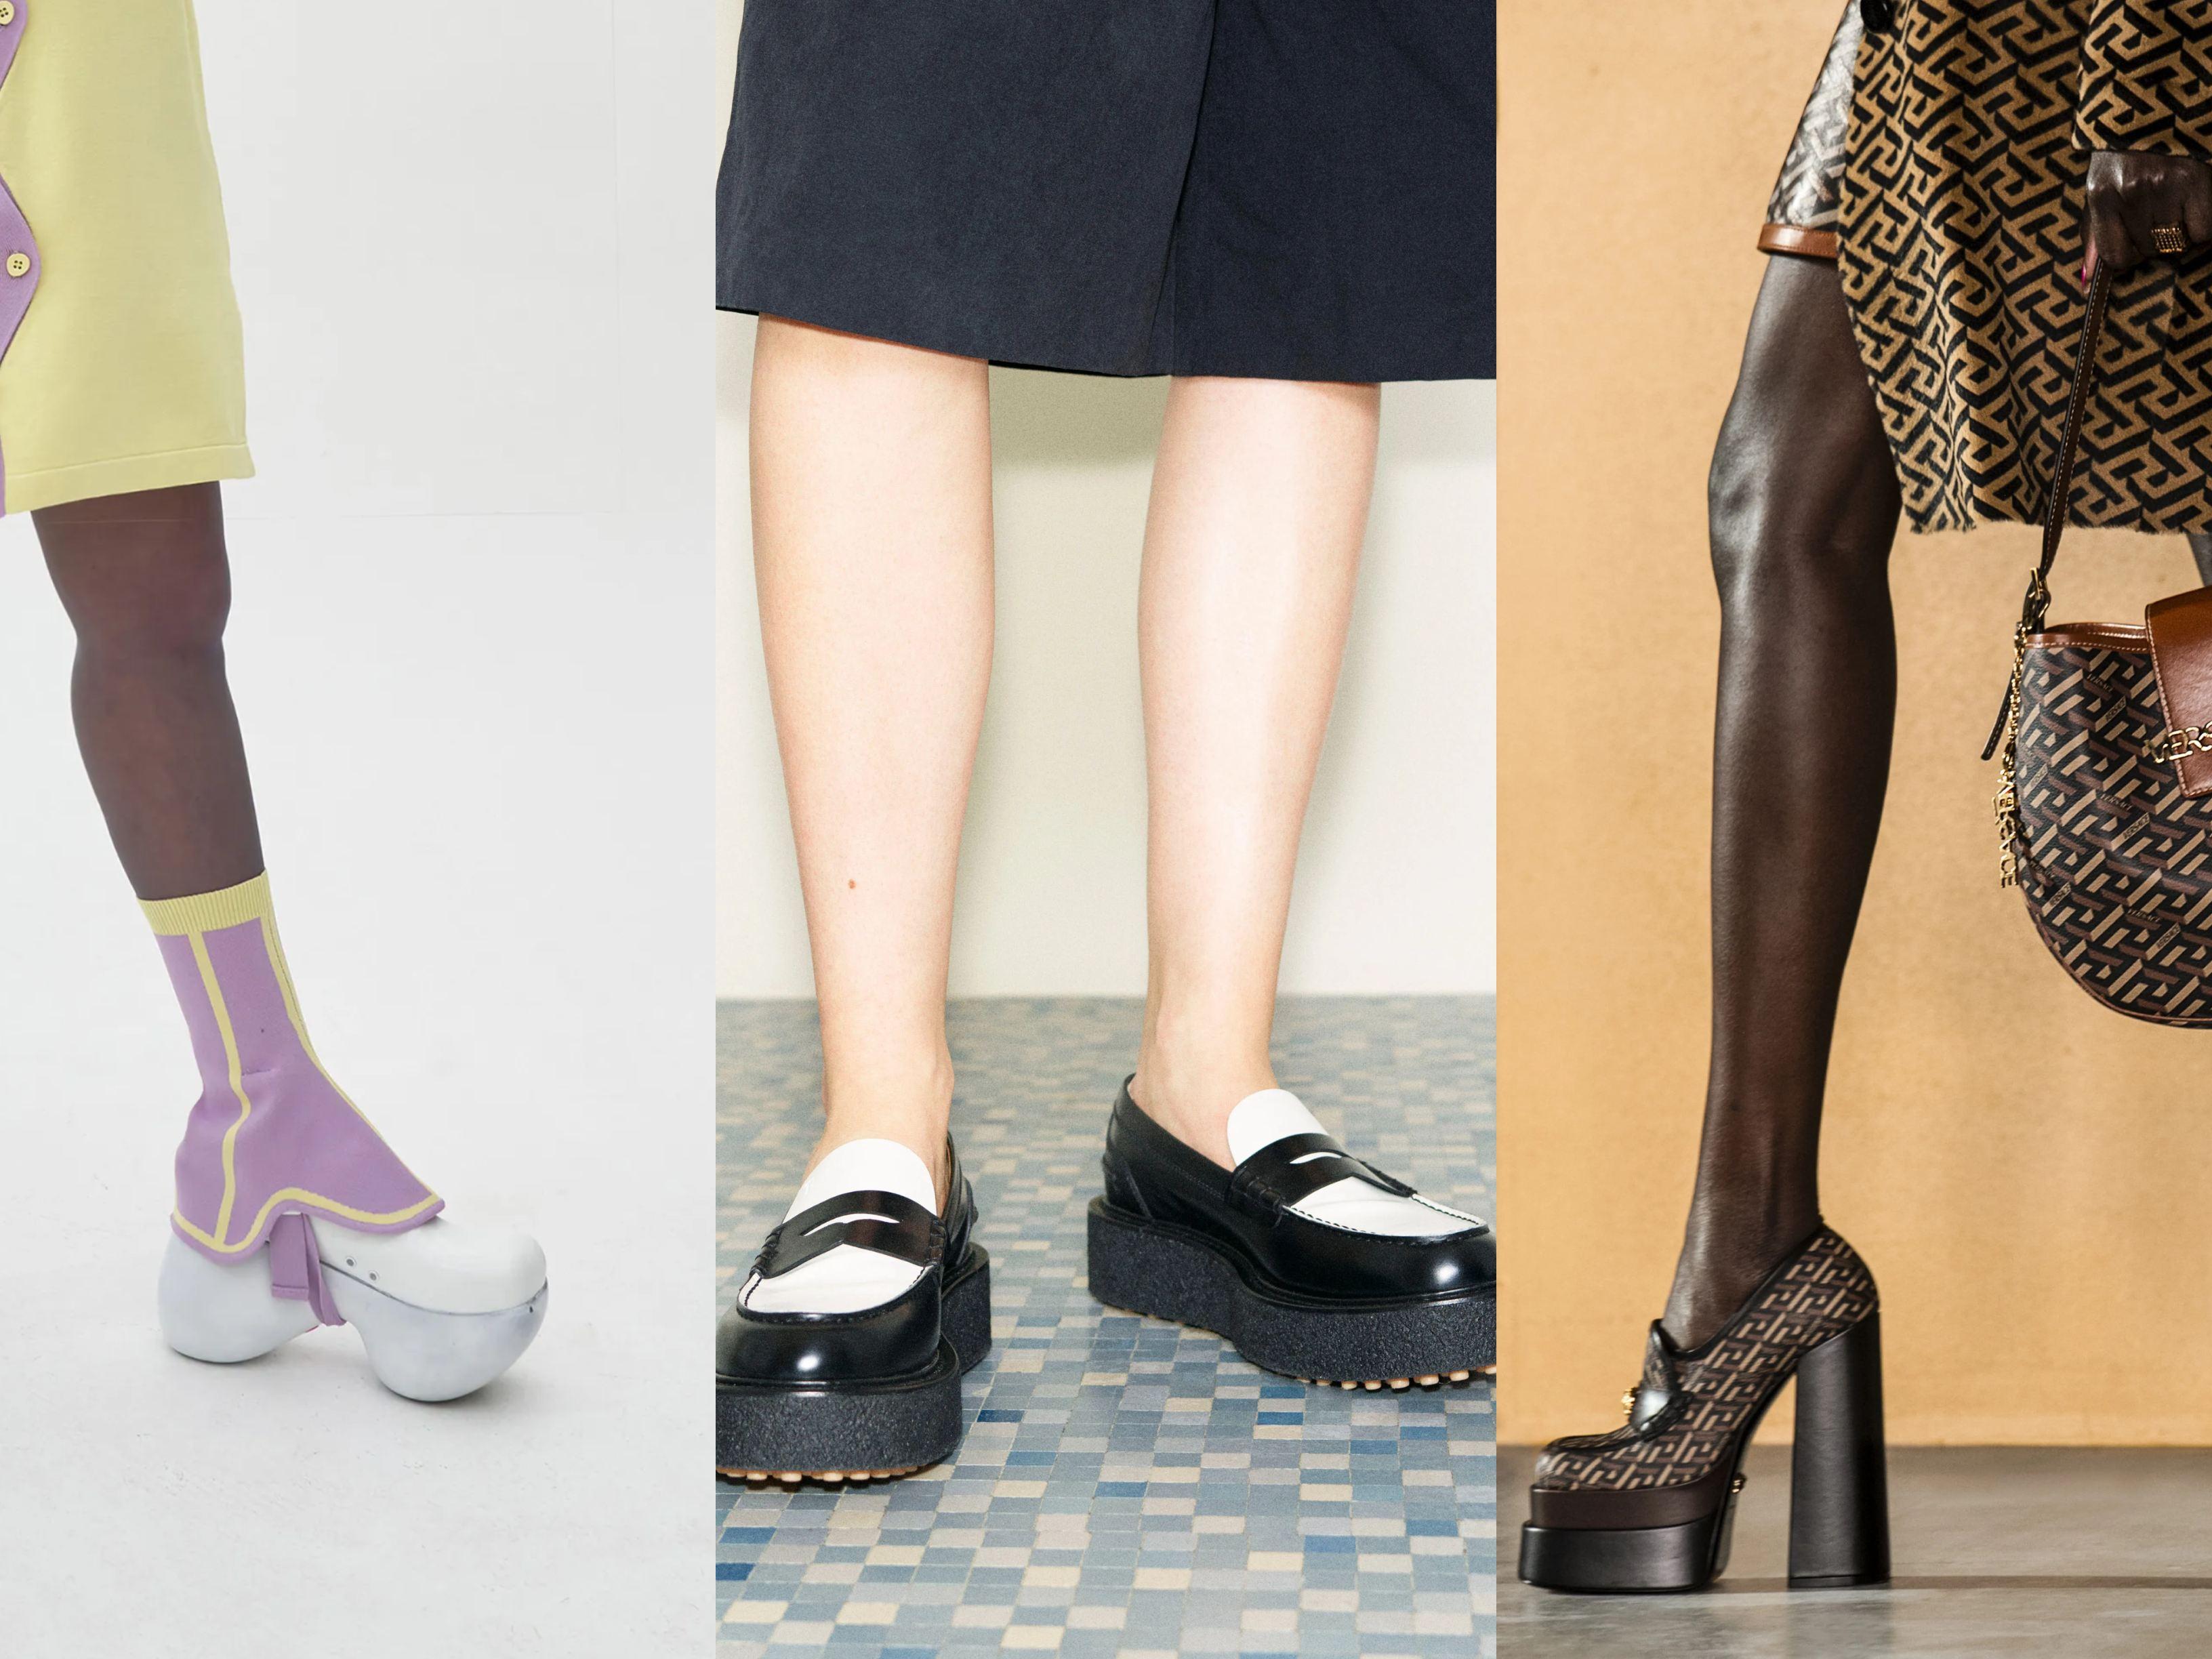 Models wearing AW21 Trends Platform shoes